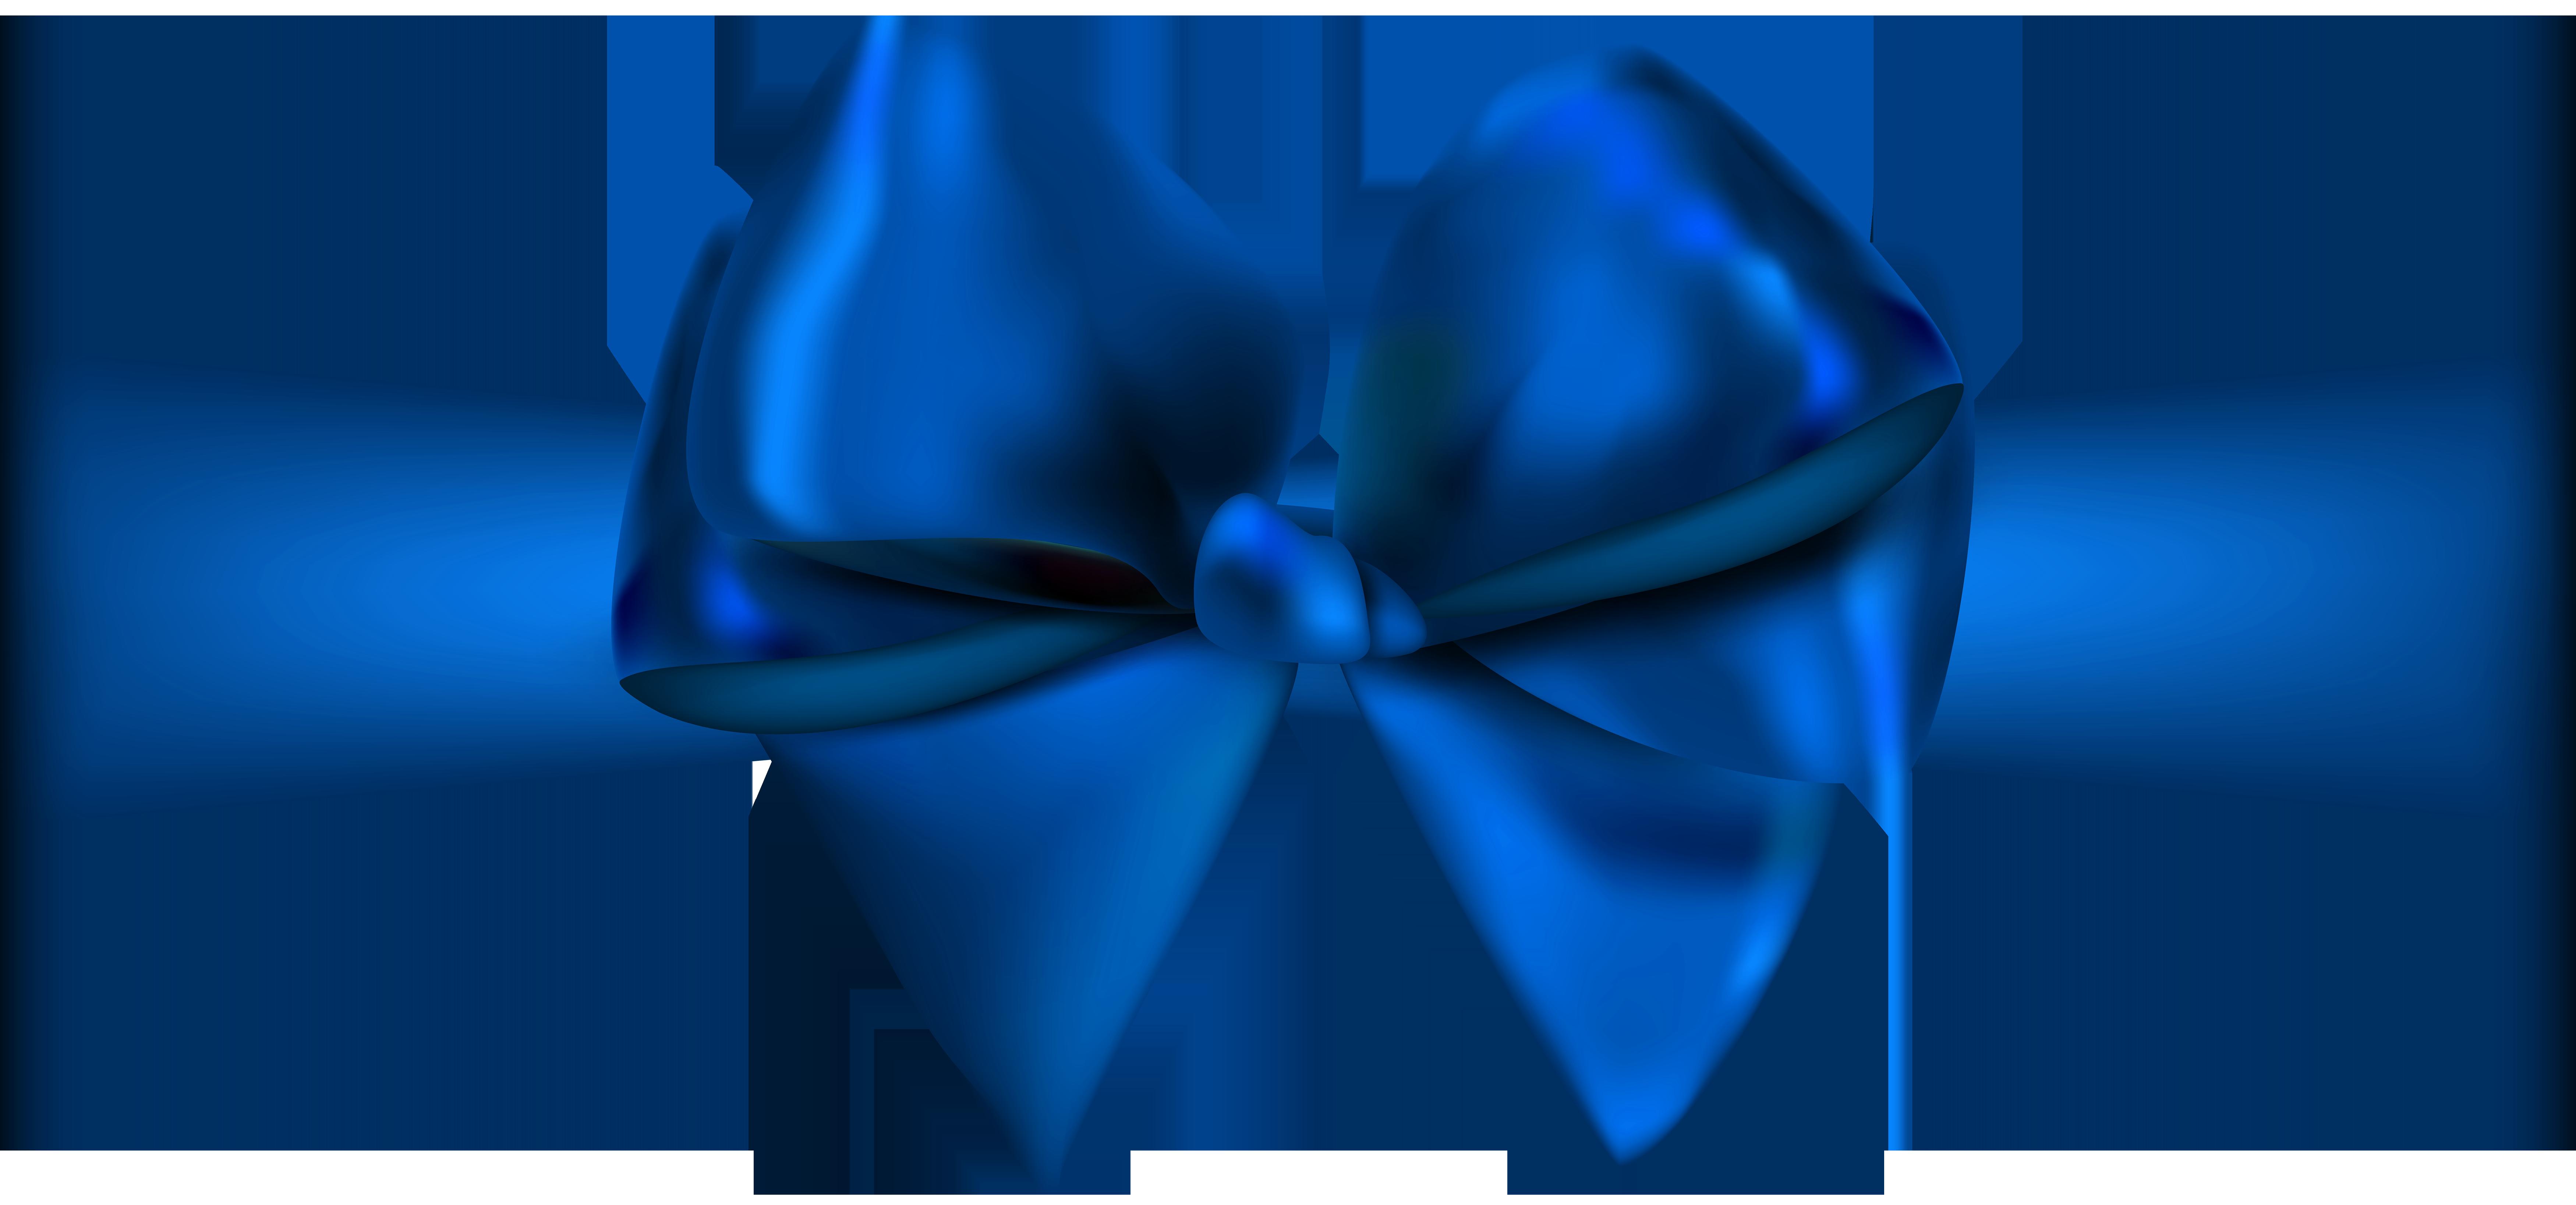 Blu side bo ribbon. Clipart balloon navy blue